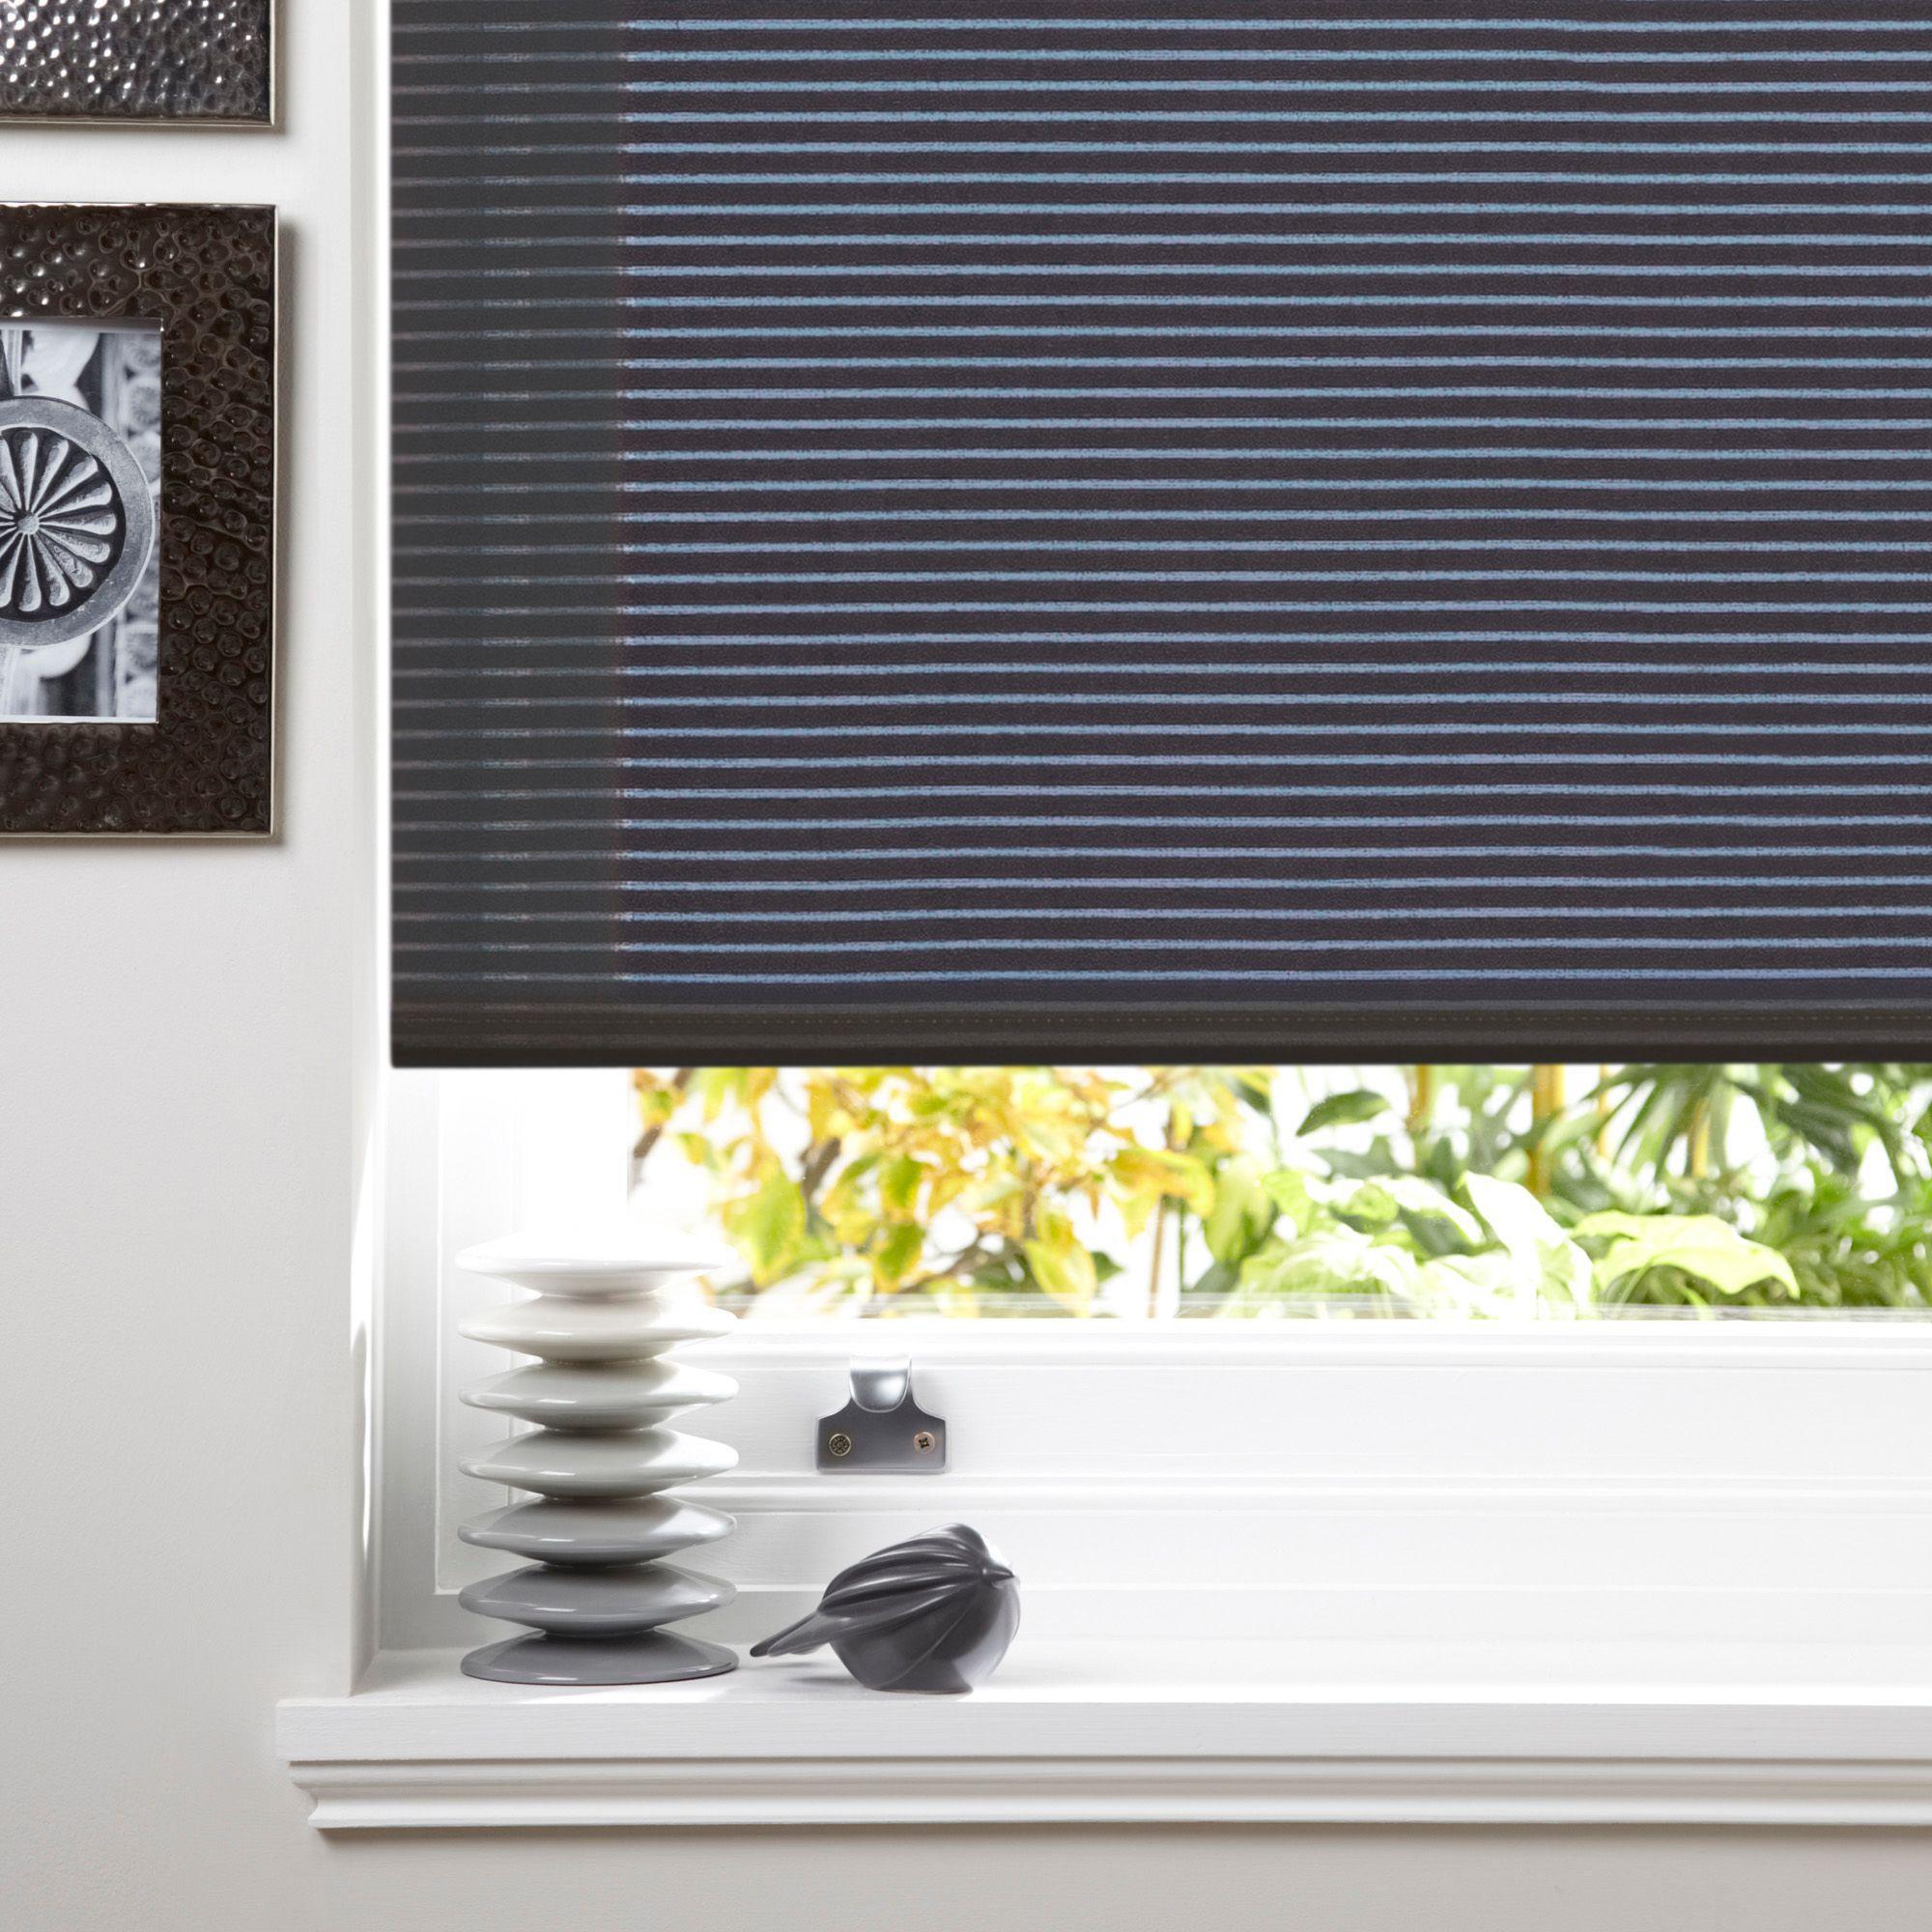 Bathroom Window Blinds B&Q colours alexsa corded grey roller blind (l)160 cm (w)120 cm